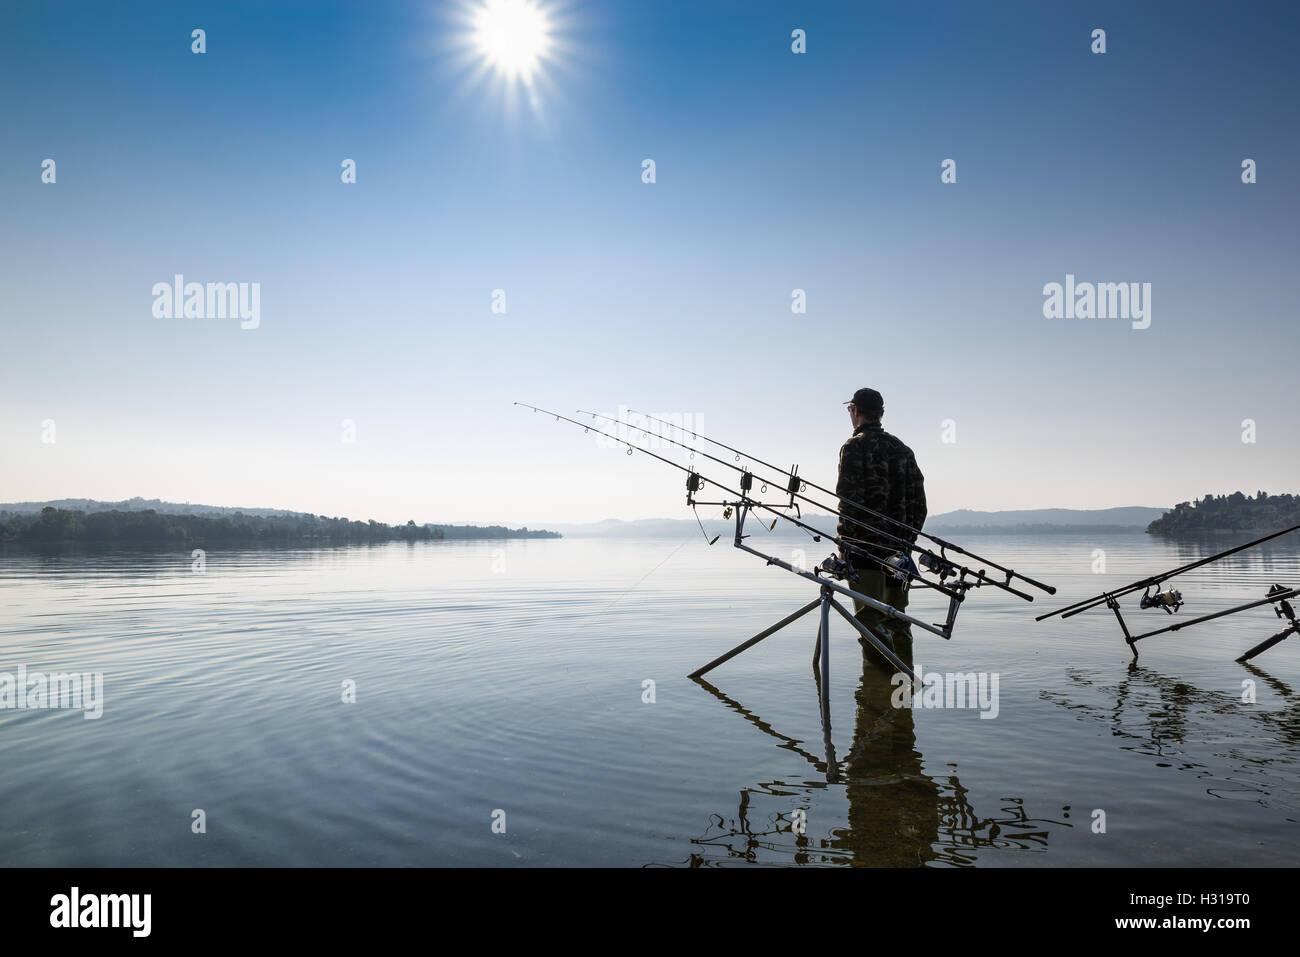 Aventuras de pesca. Pescador cerca del equipo carpfishing Imagen De Stock